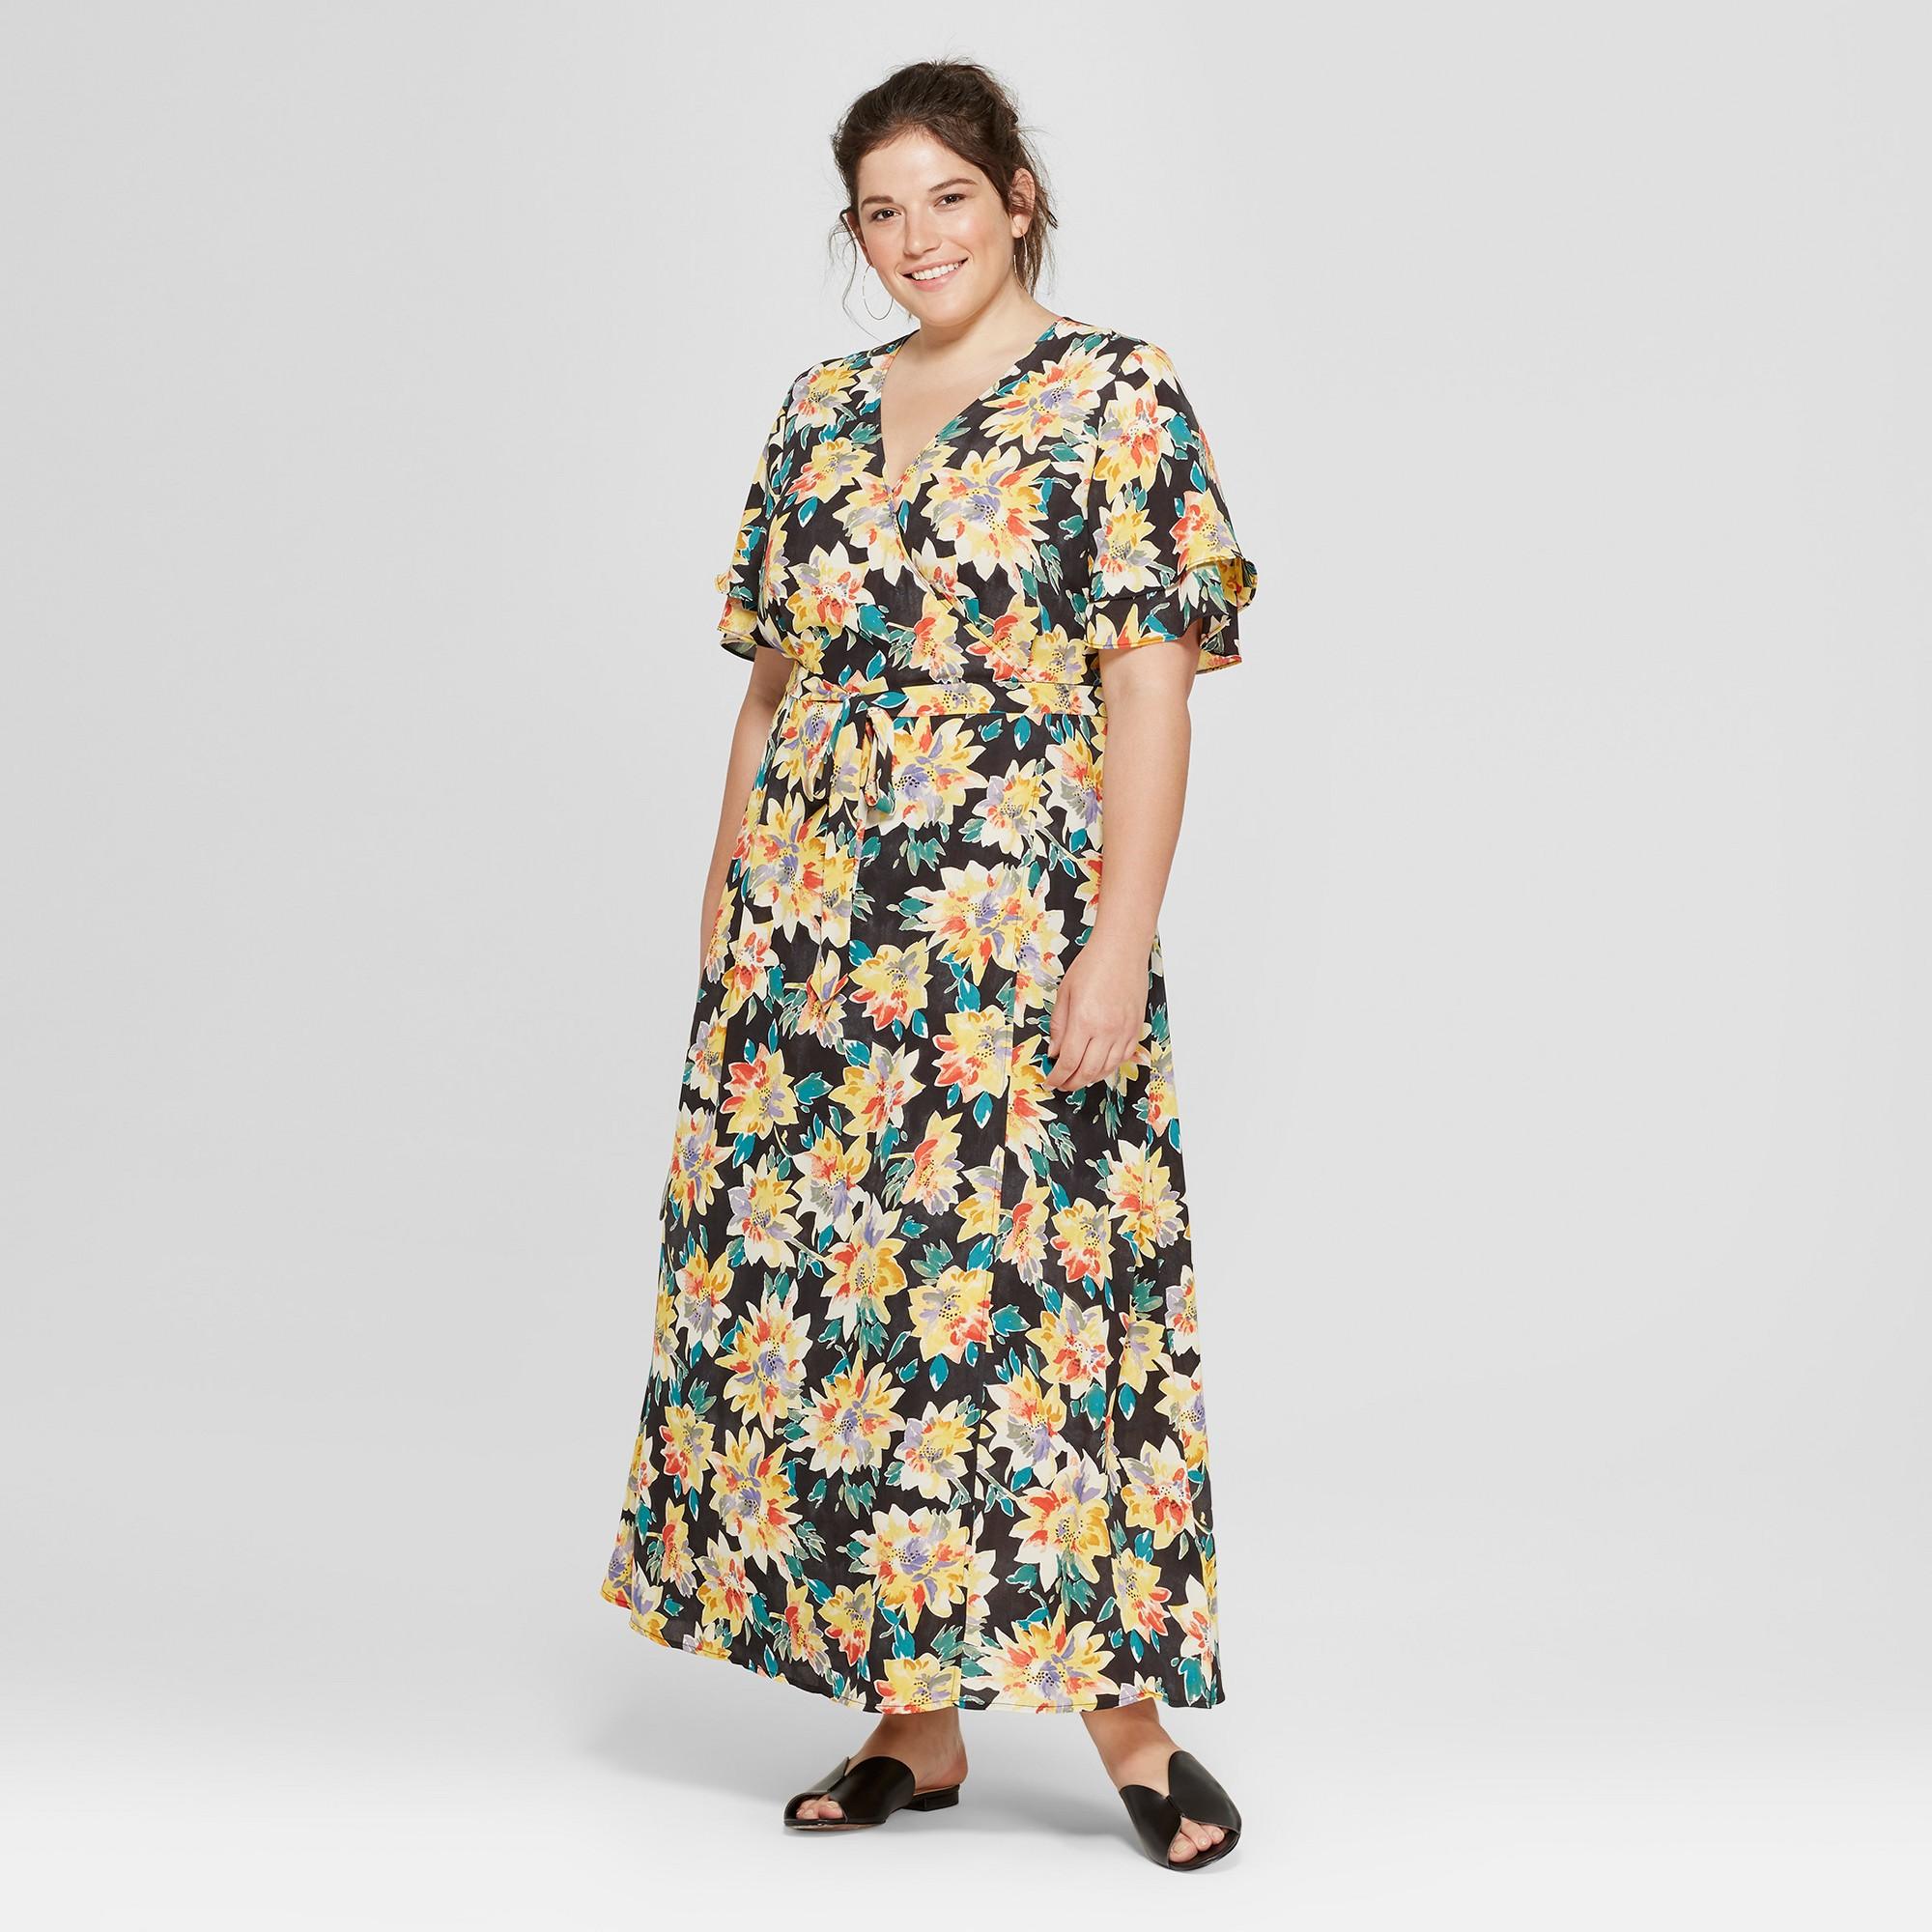 a70ad9f5cc456 Women's Plus Size Floral Print Wrap Maxi Dress - Ava & Viv Black 2X ...